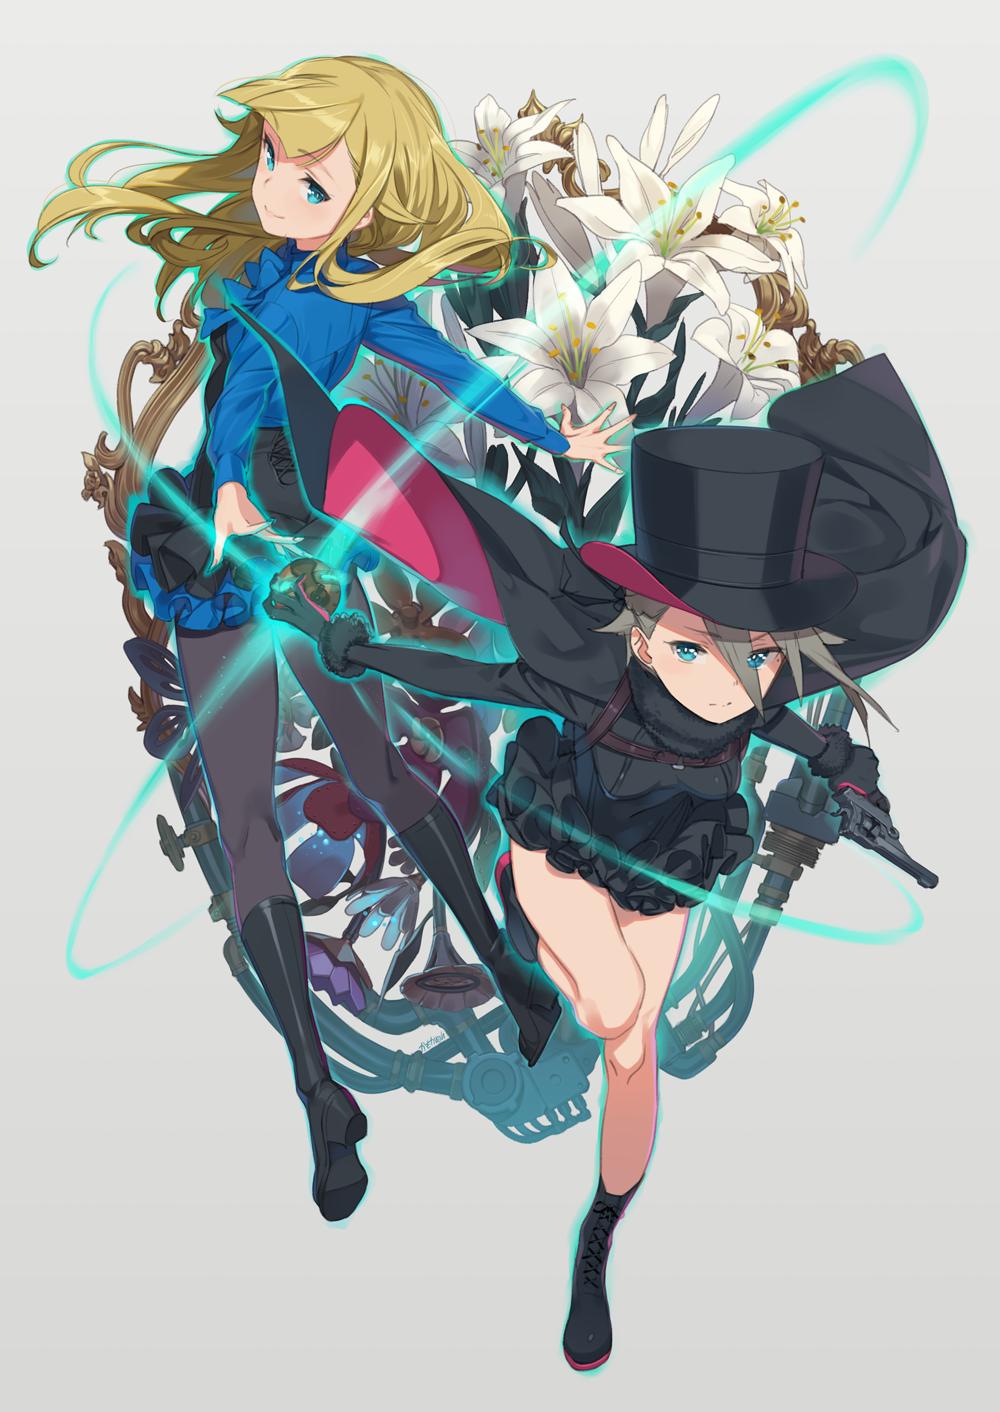 Princess Principal Wallpaper Ange X Princess キャラクター